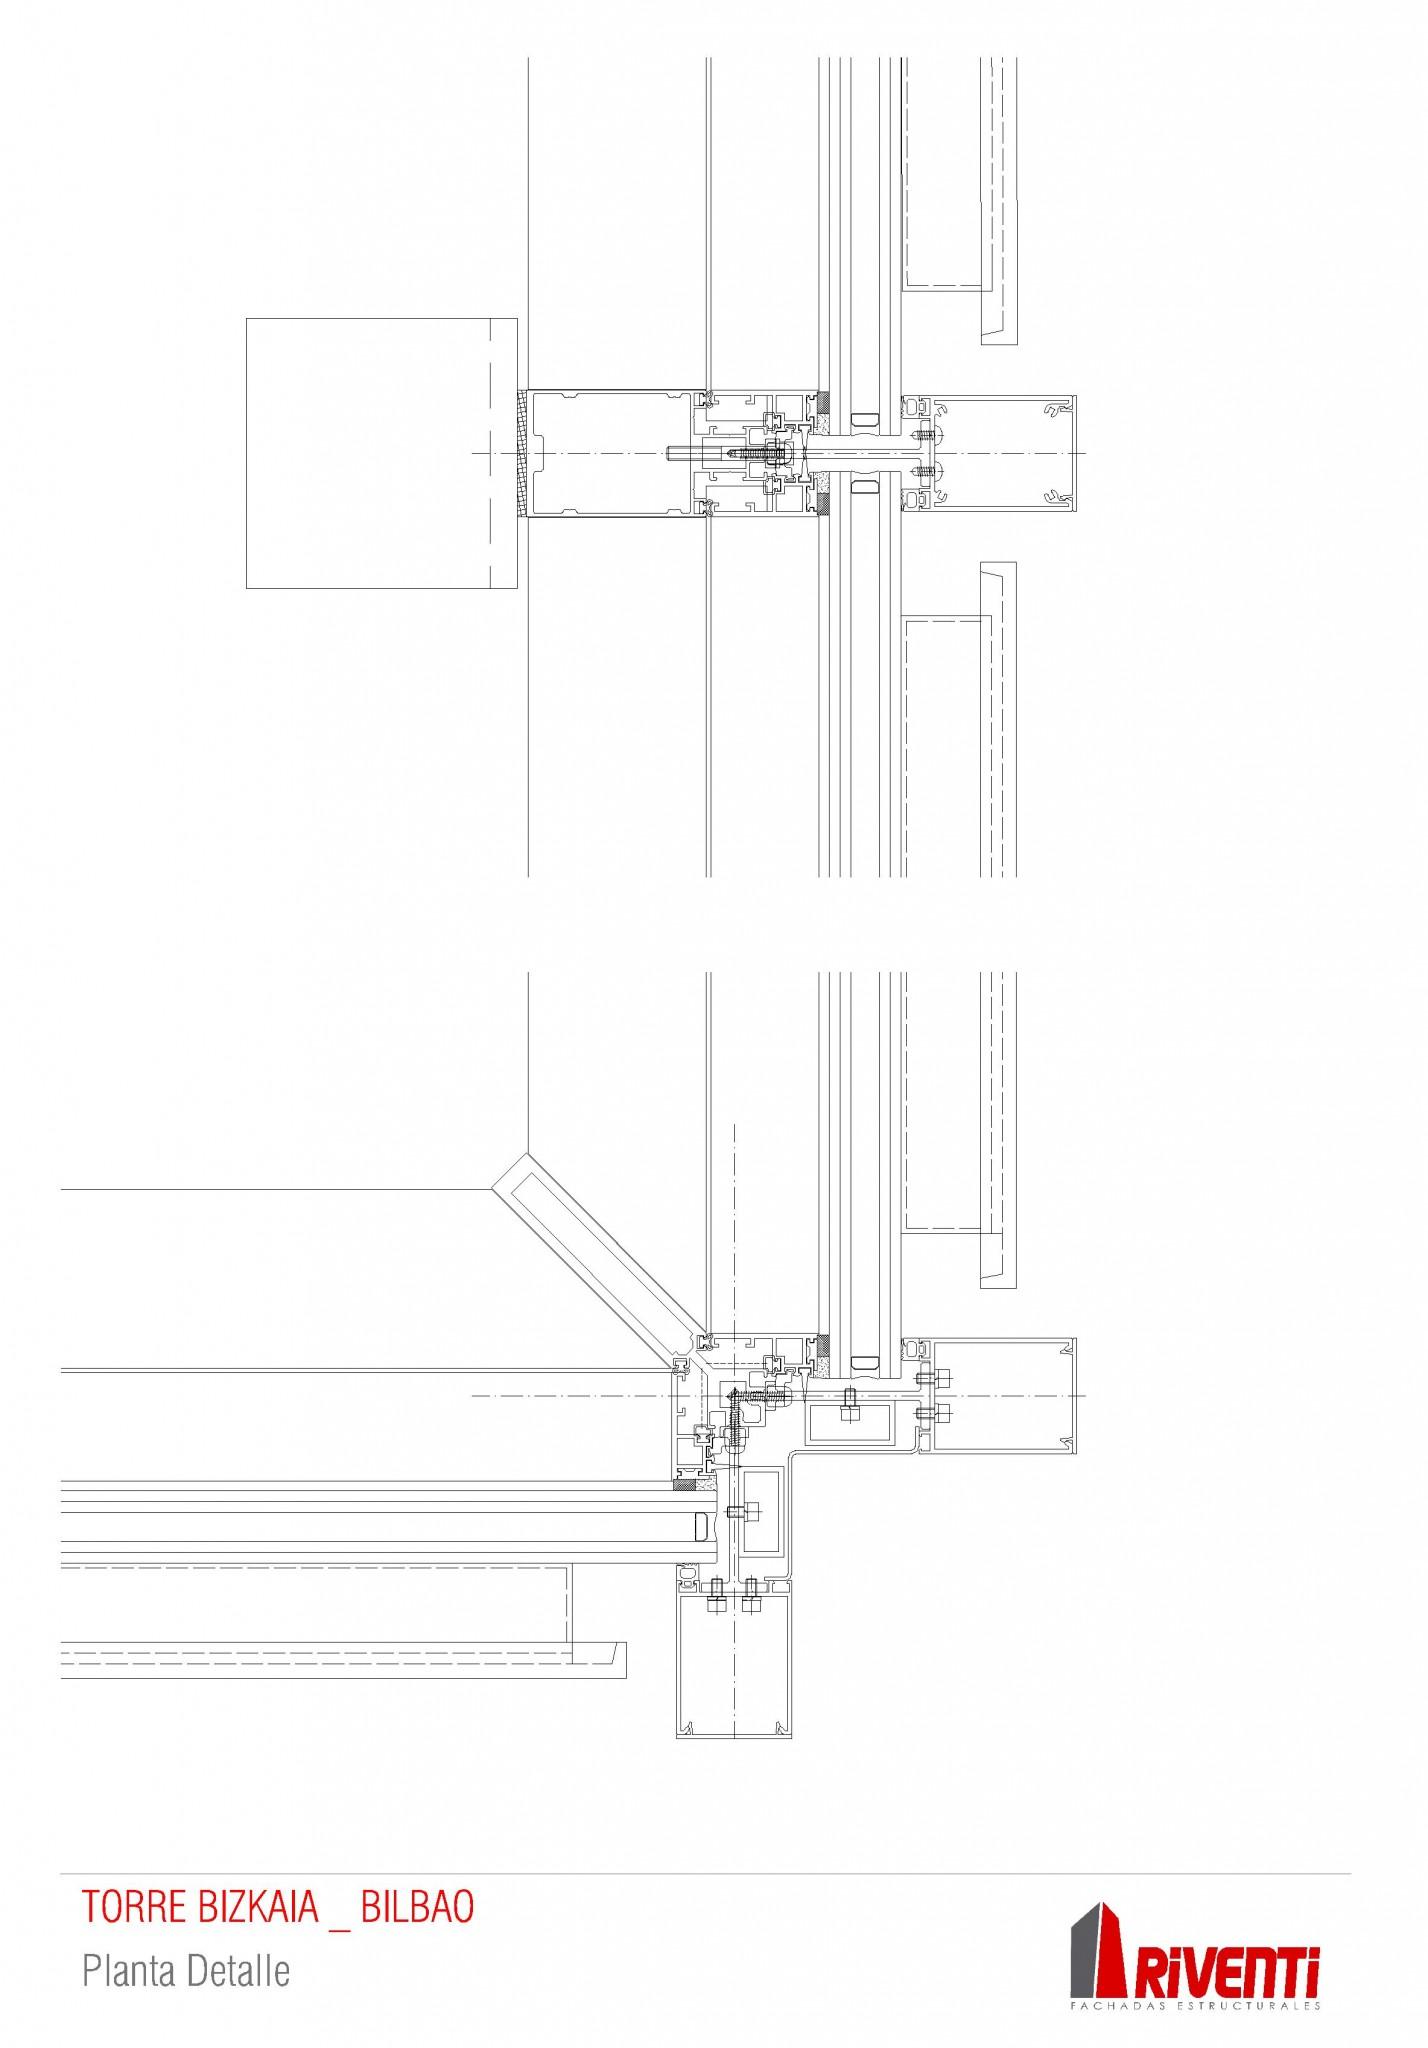 Planta detalle fachada Torre Bizkaia